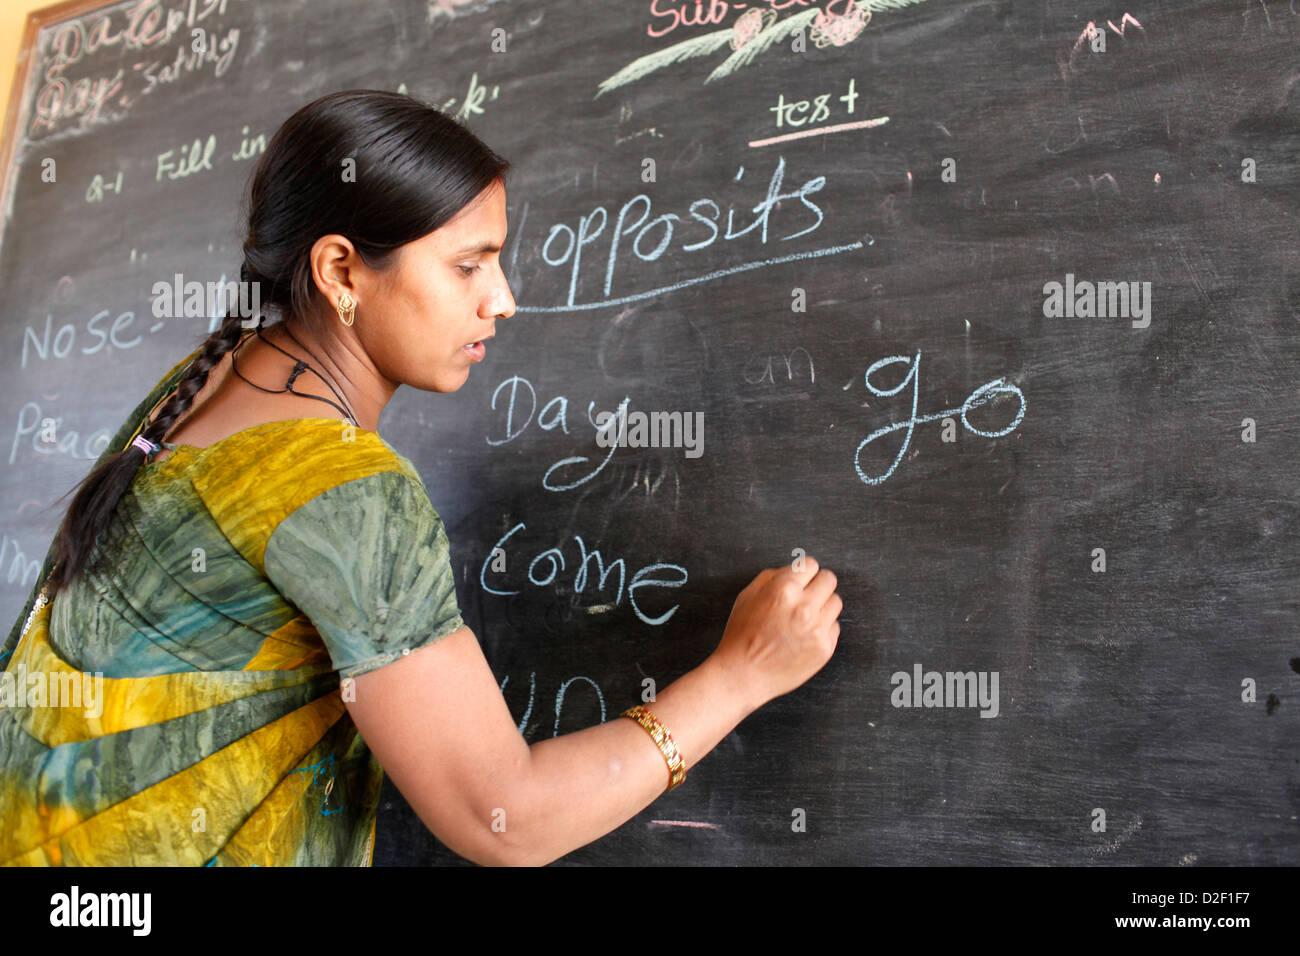 Sandipani Muni high school teacher Vrindavan. India. - Stock Image